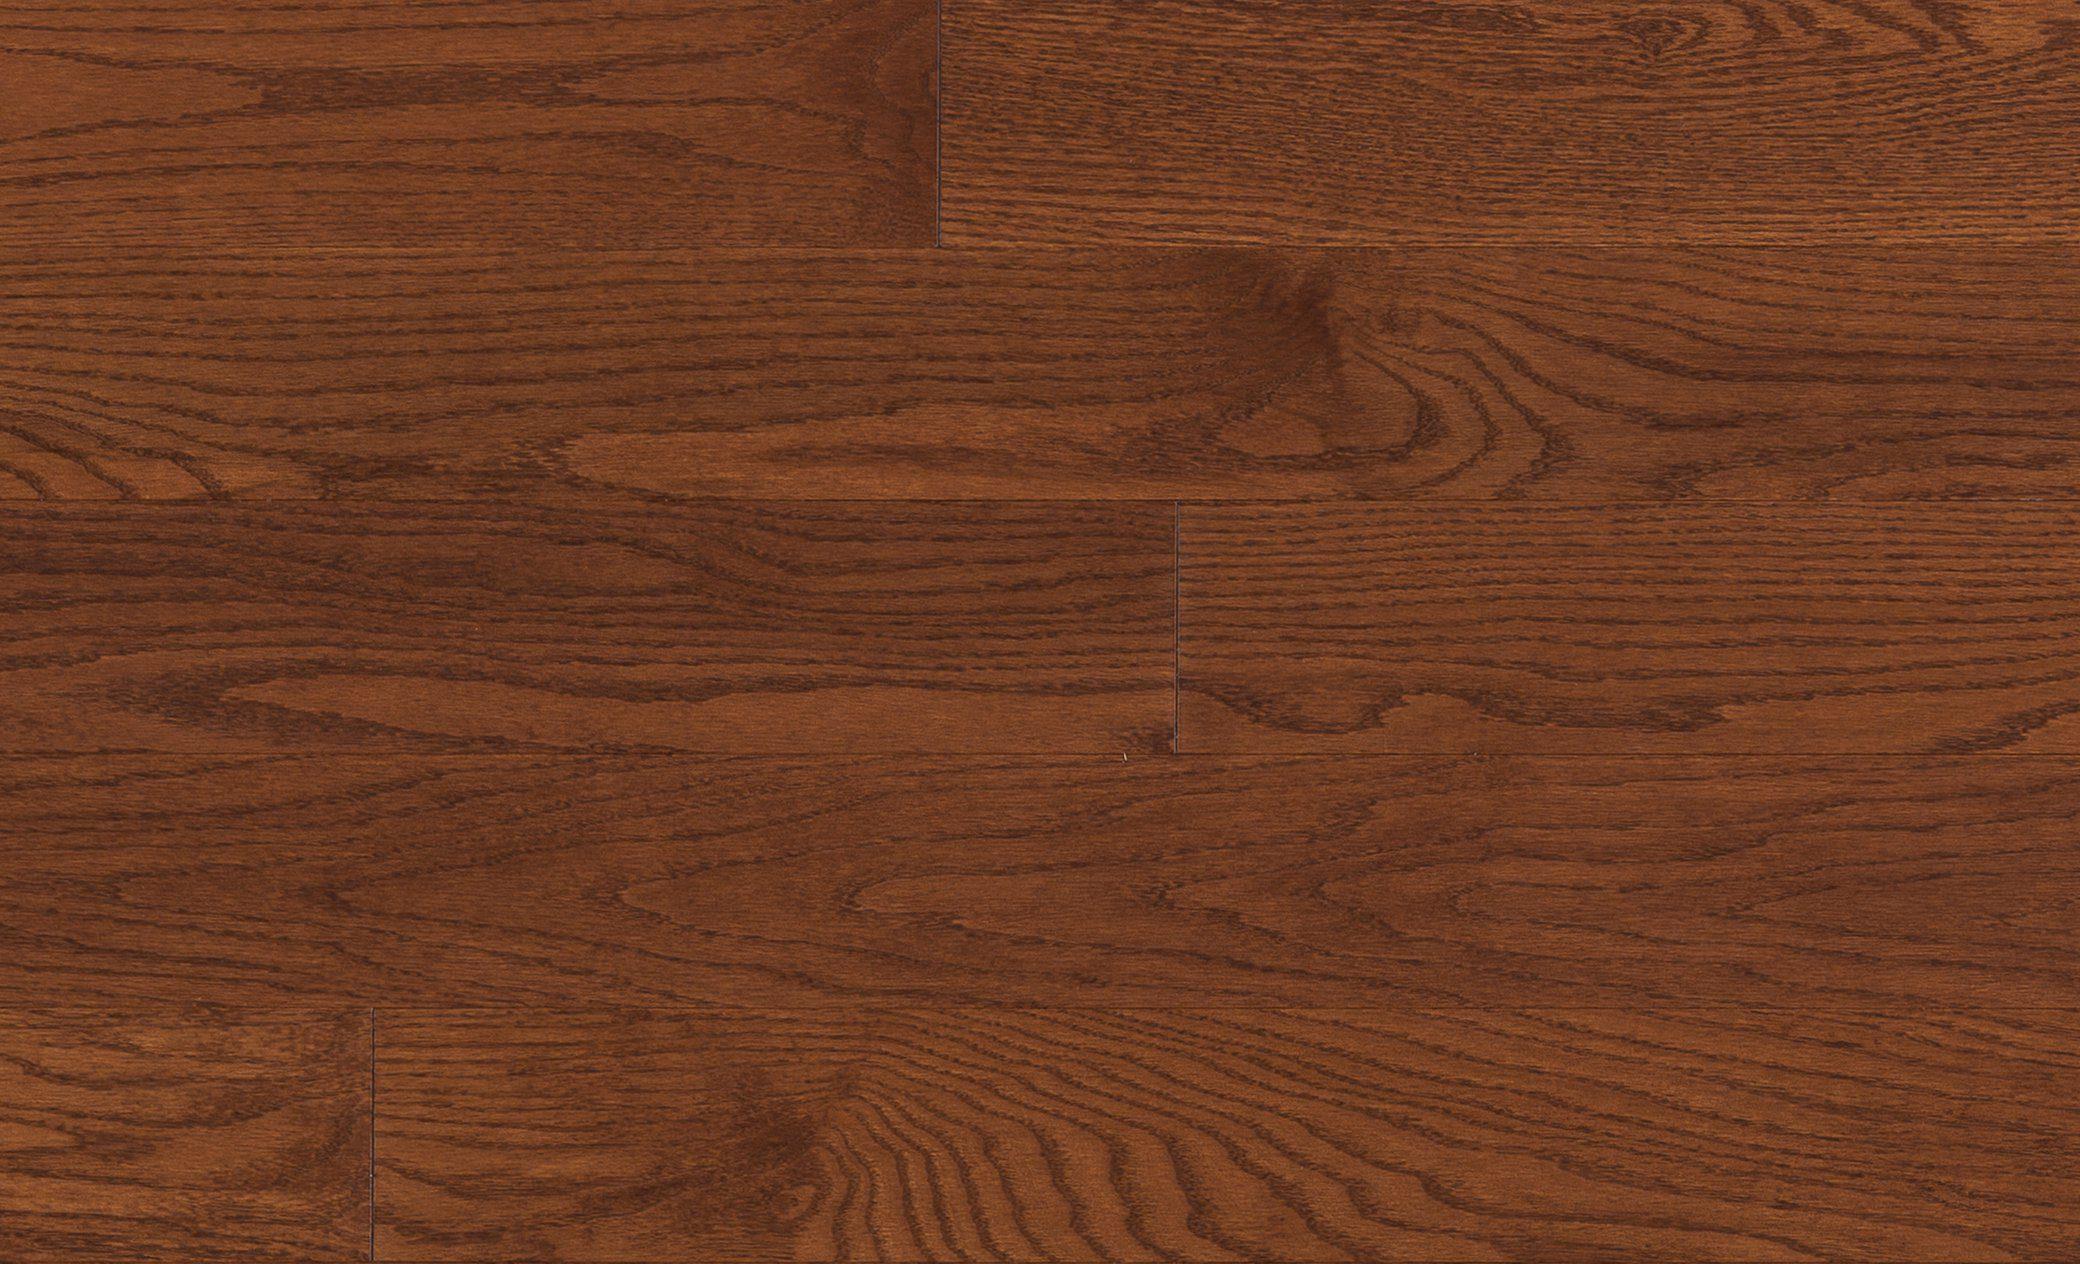 Mercier Red Oak Amaretto Solid Width: 2 1/4